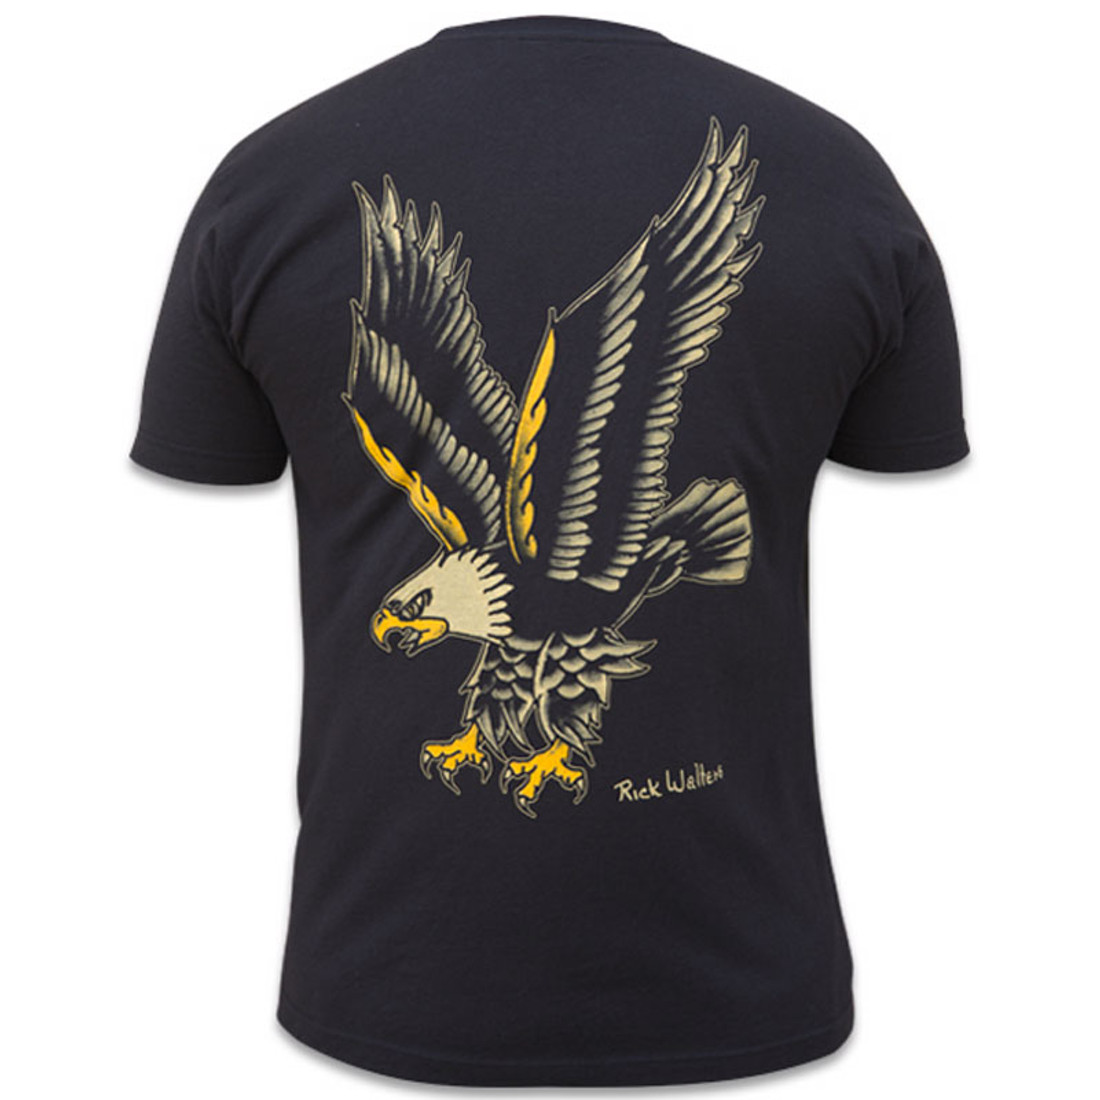 Eagle by Rick Walters Men's Black Tattoo Tee Shirt